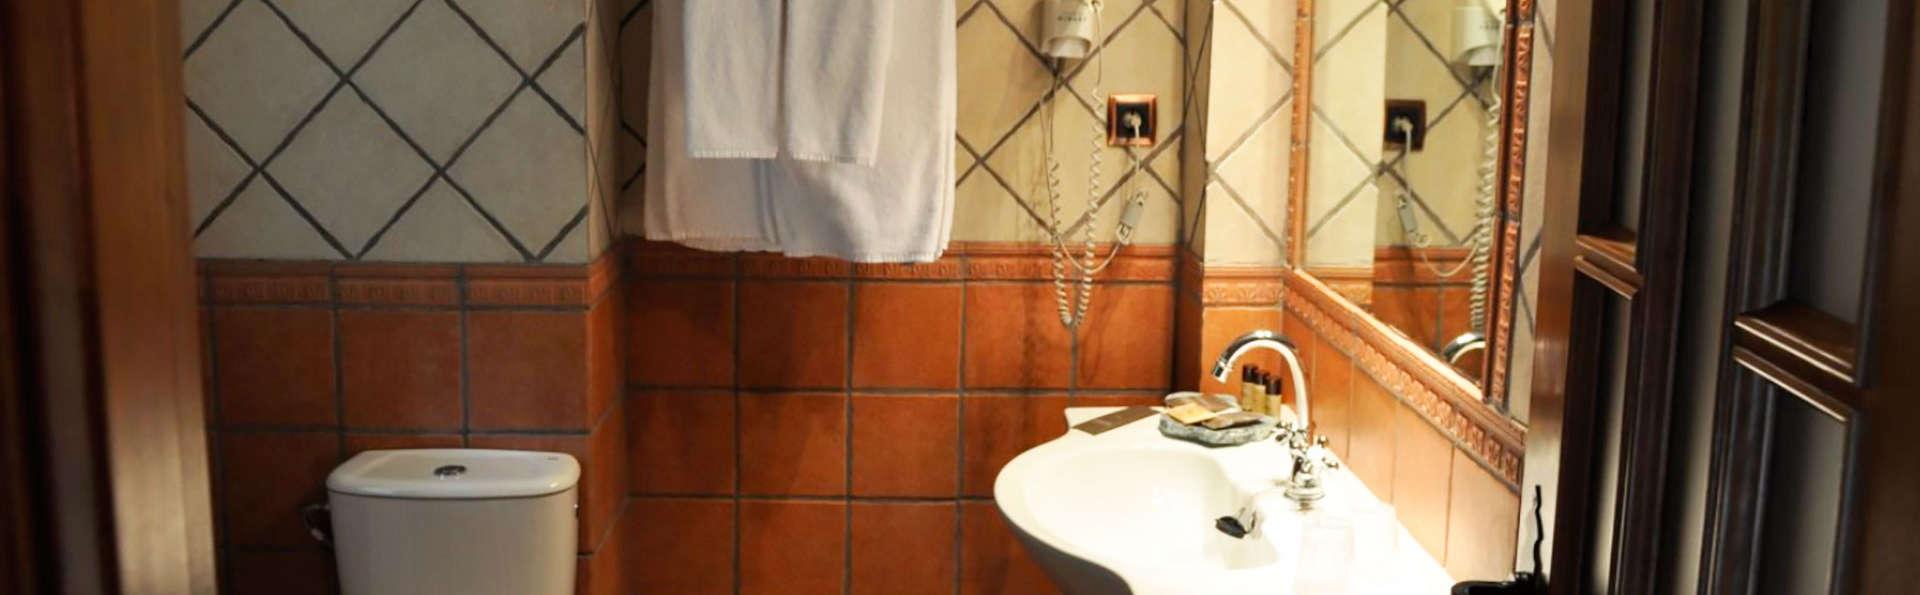 Hotel casa arcas 3 villanova espagne - Hotel casa arcas ...